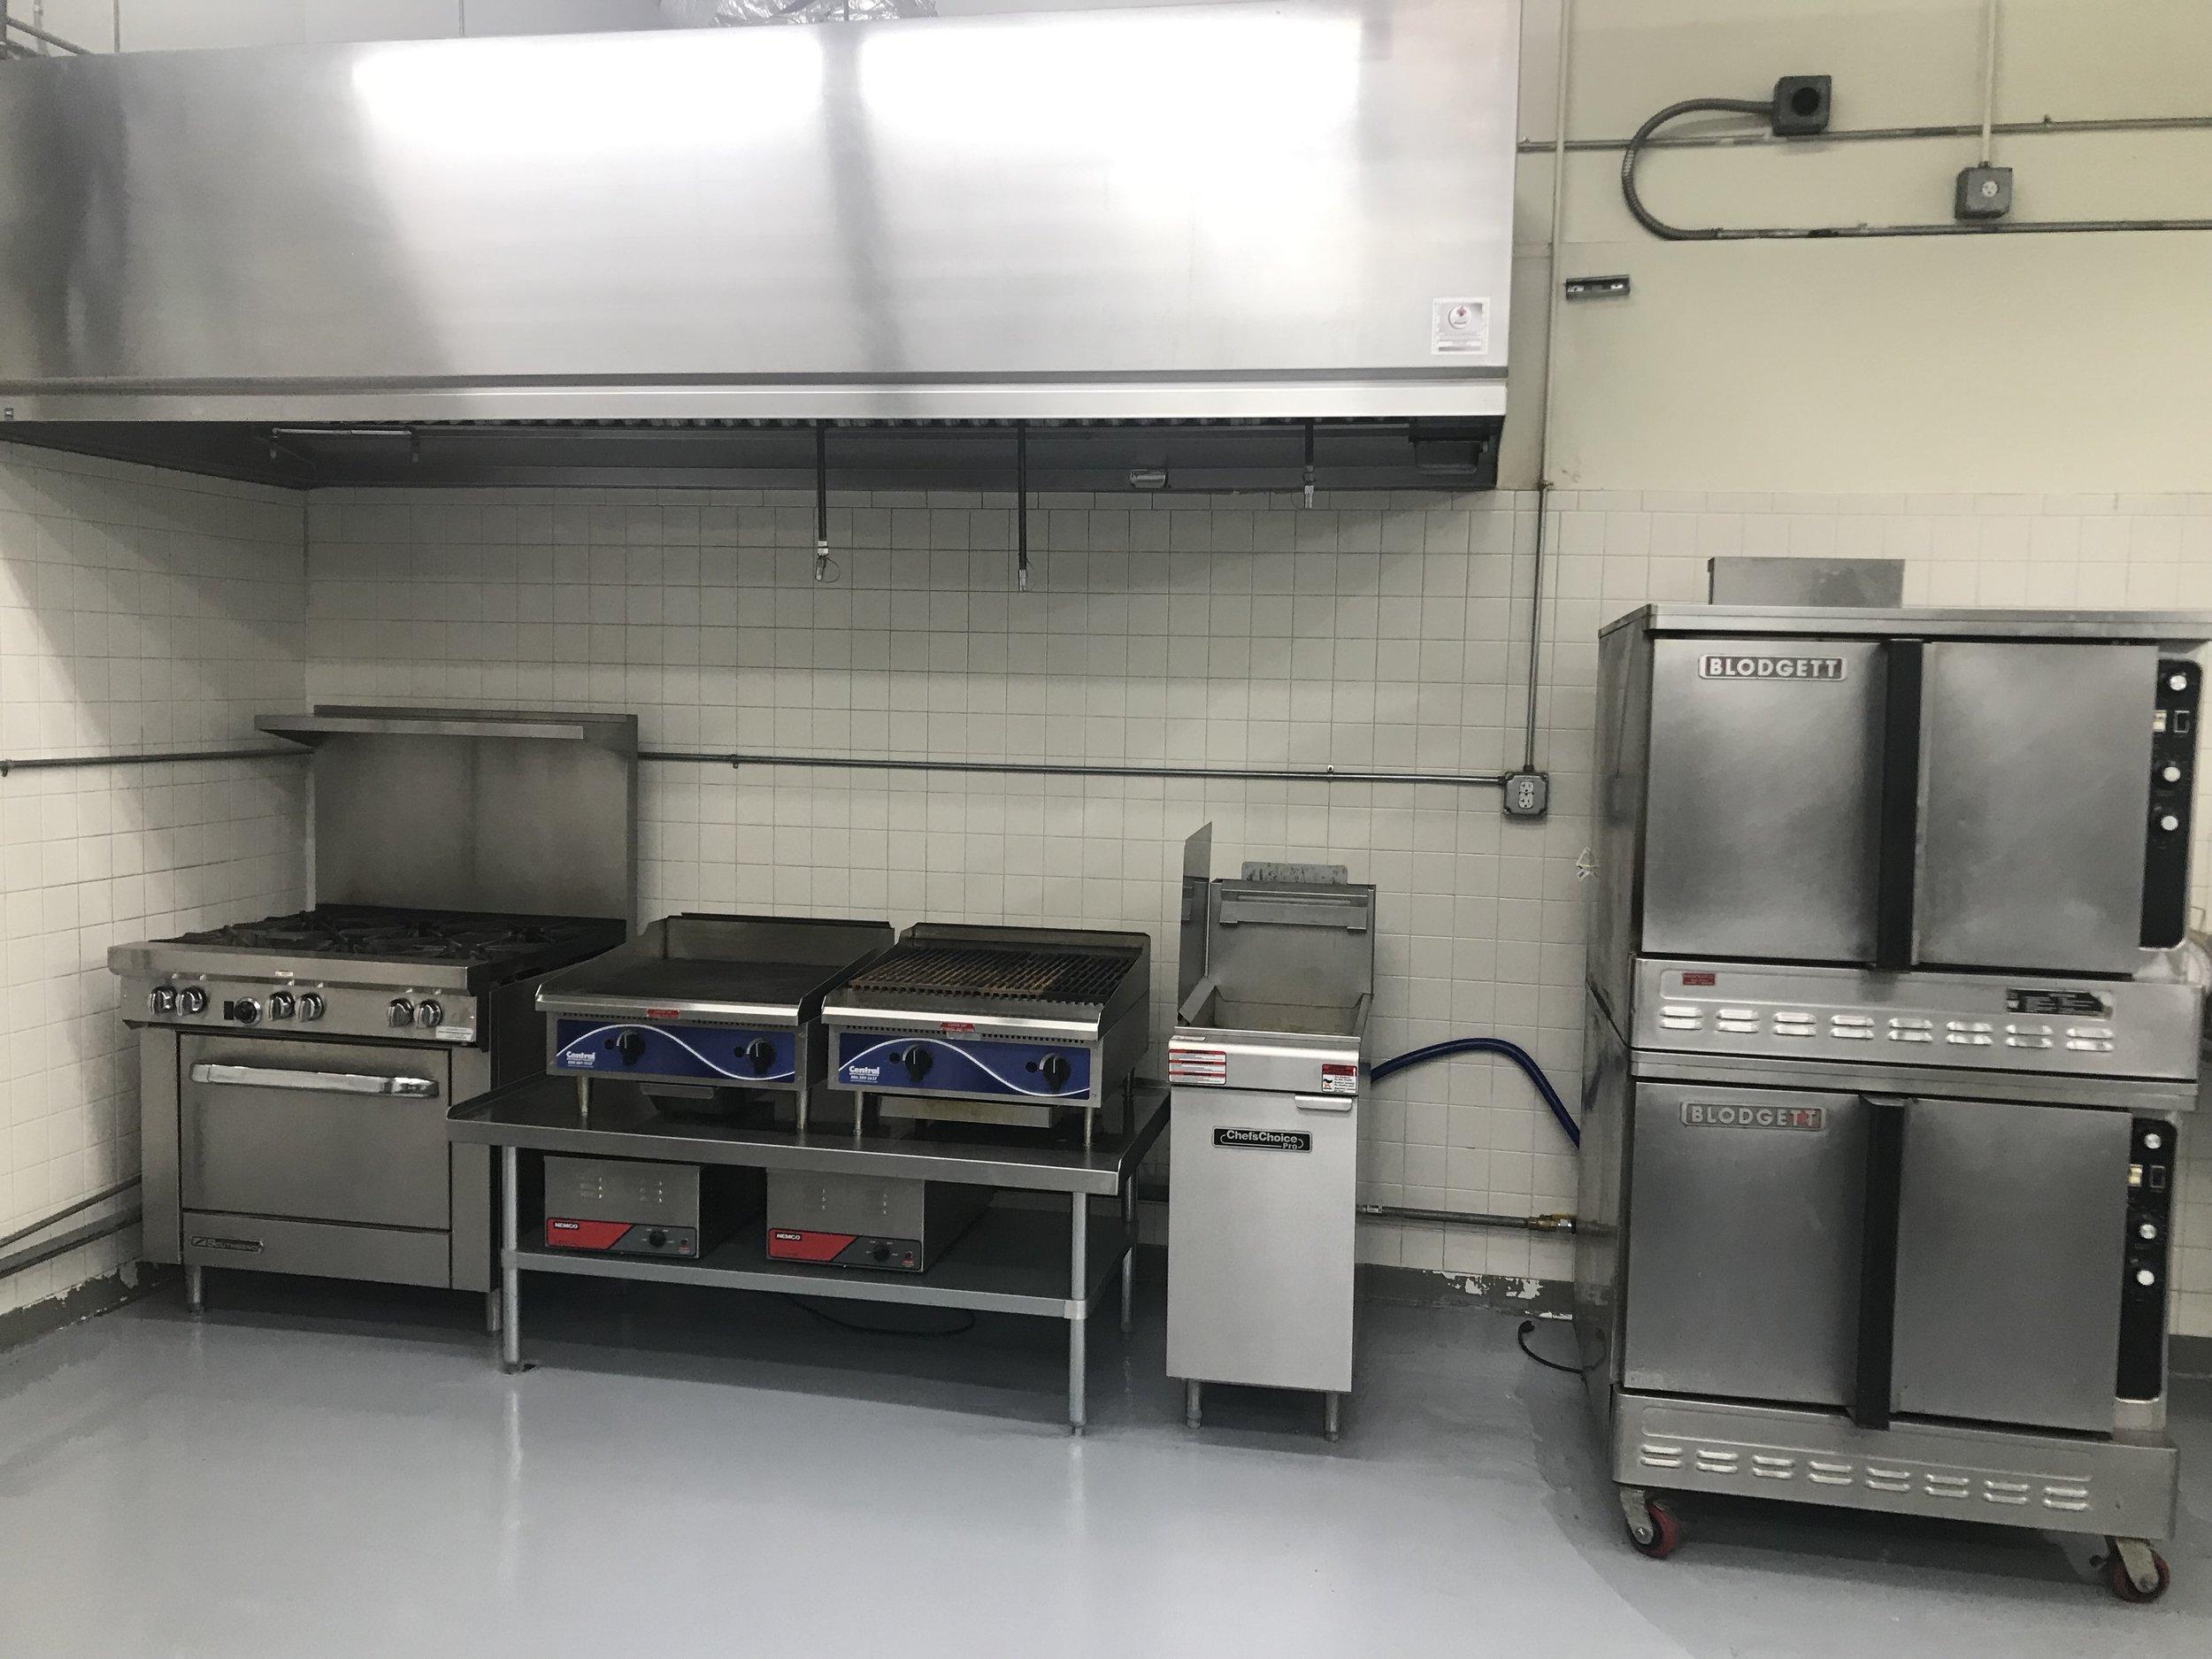 Full Kitchen - Fryer, Grill, Ovens